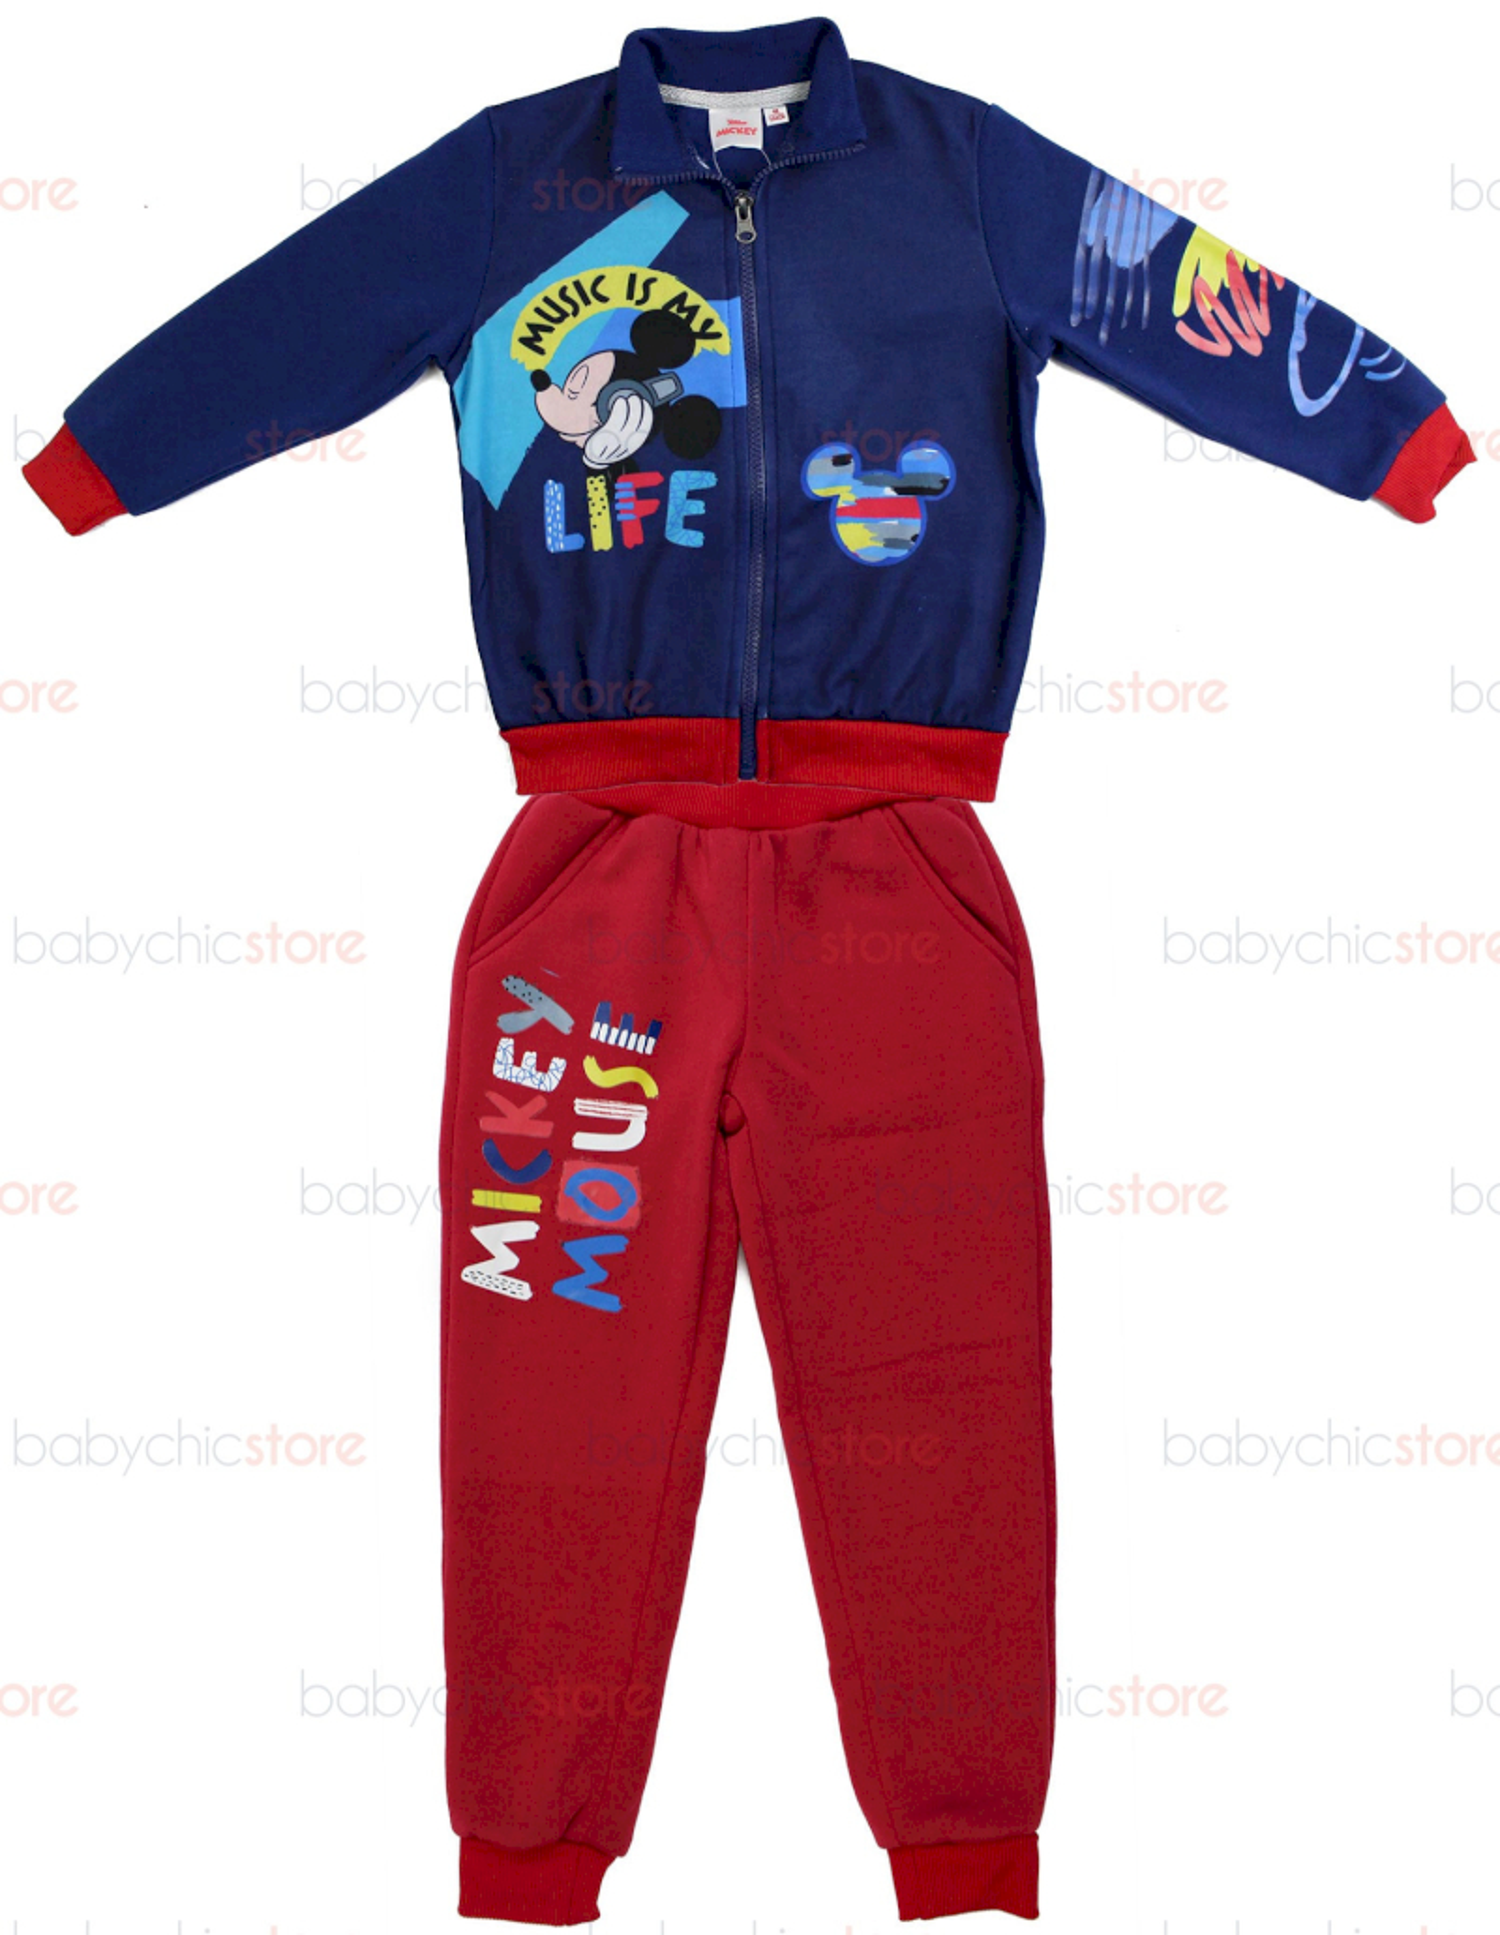 Jogging Set Mickey Mouse - Rosso/Blu - 5 Anni